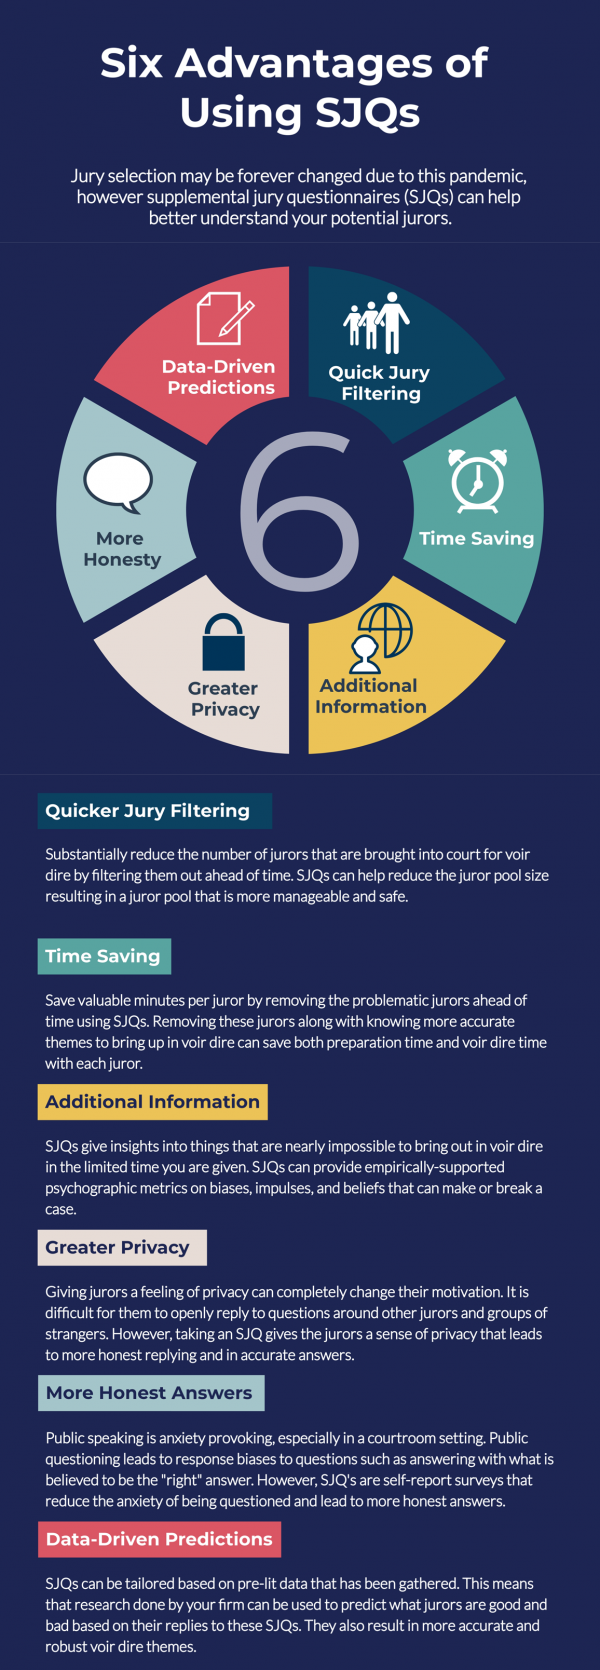 Supplemental Juror Questionnaires